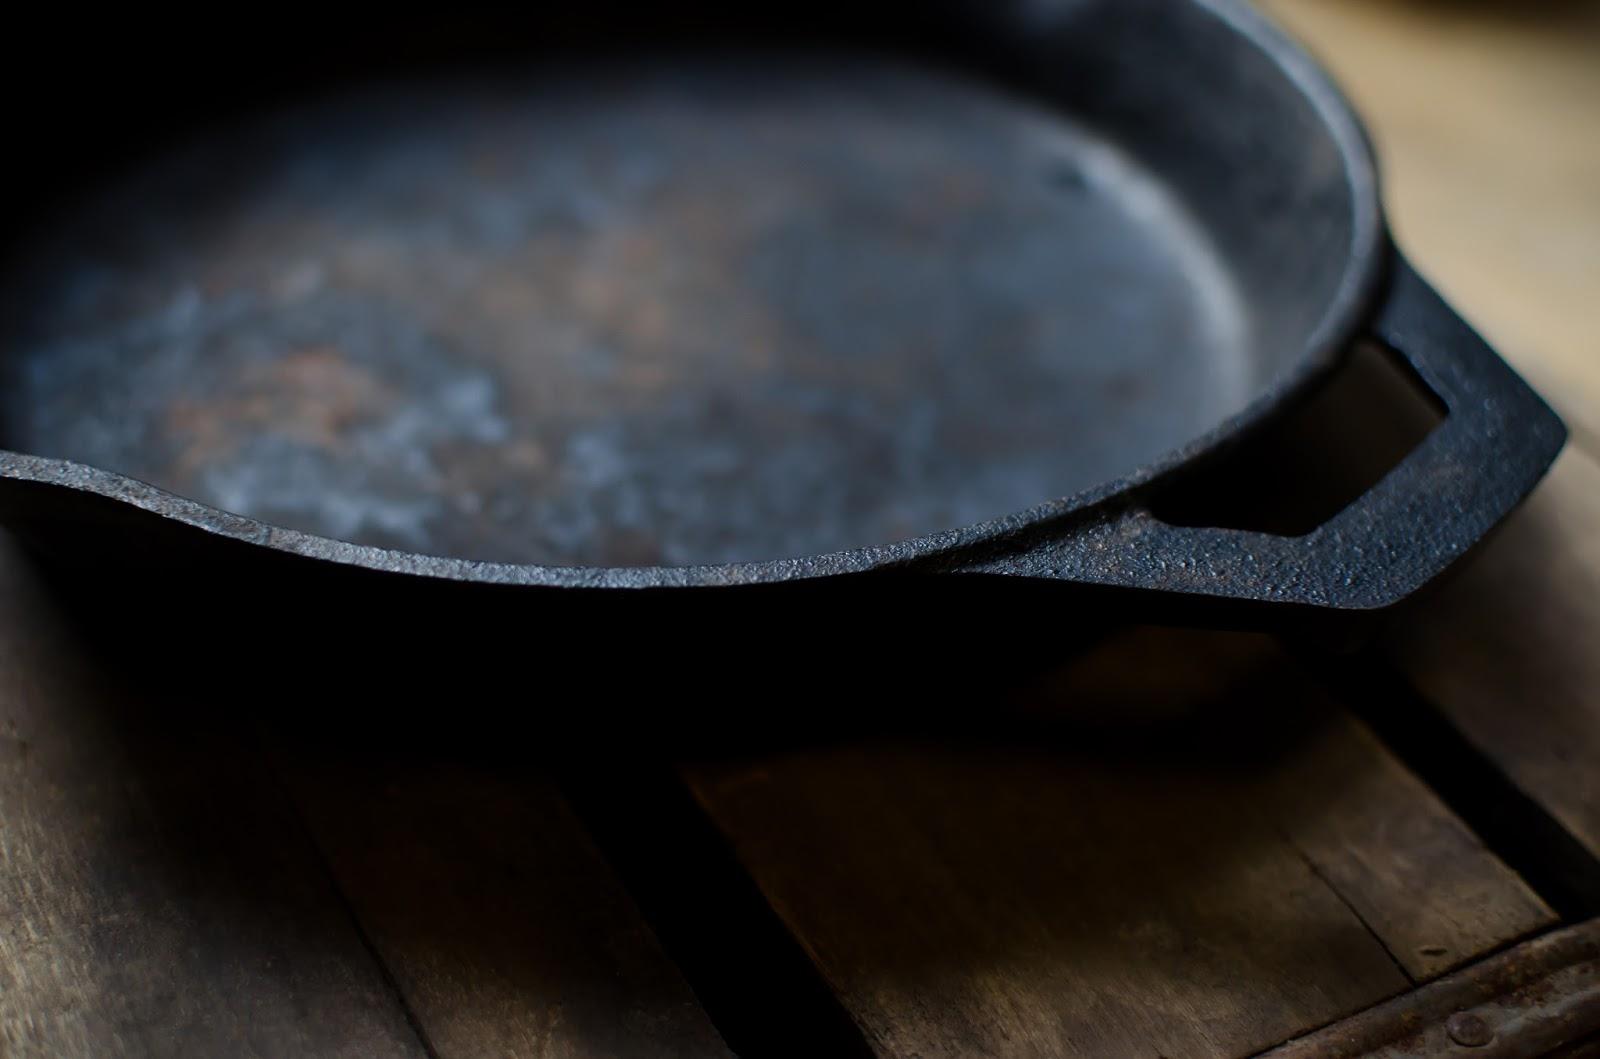 Cast Iron Care: Using & Seasoning Cookware